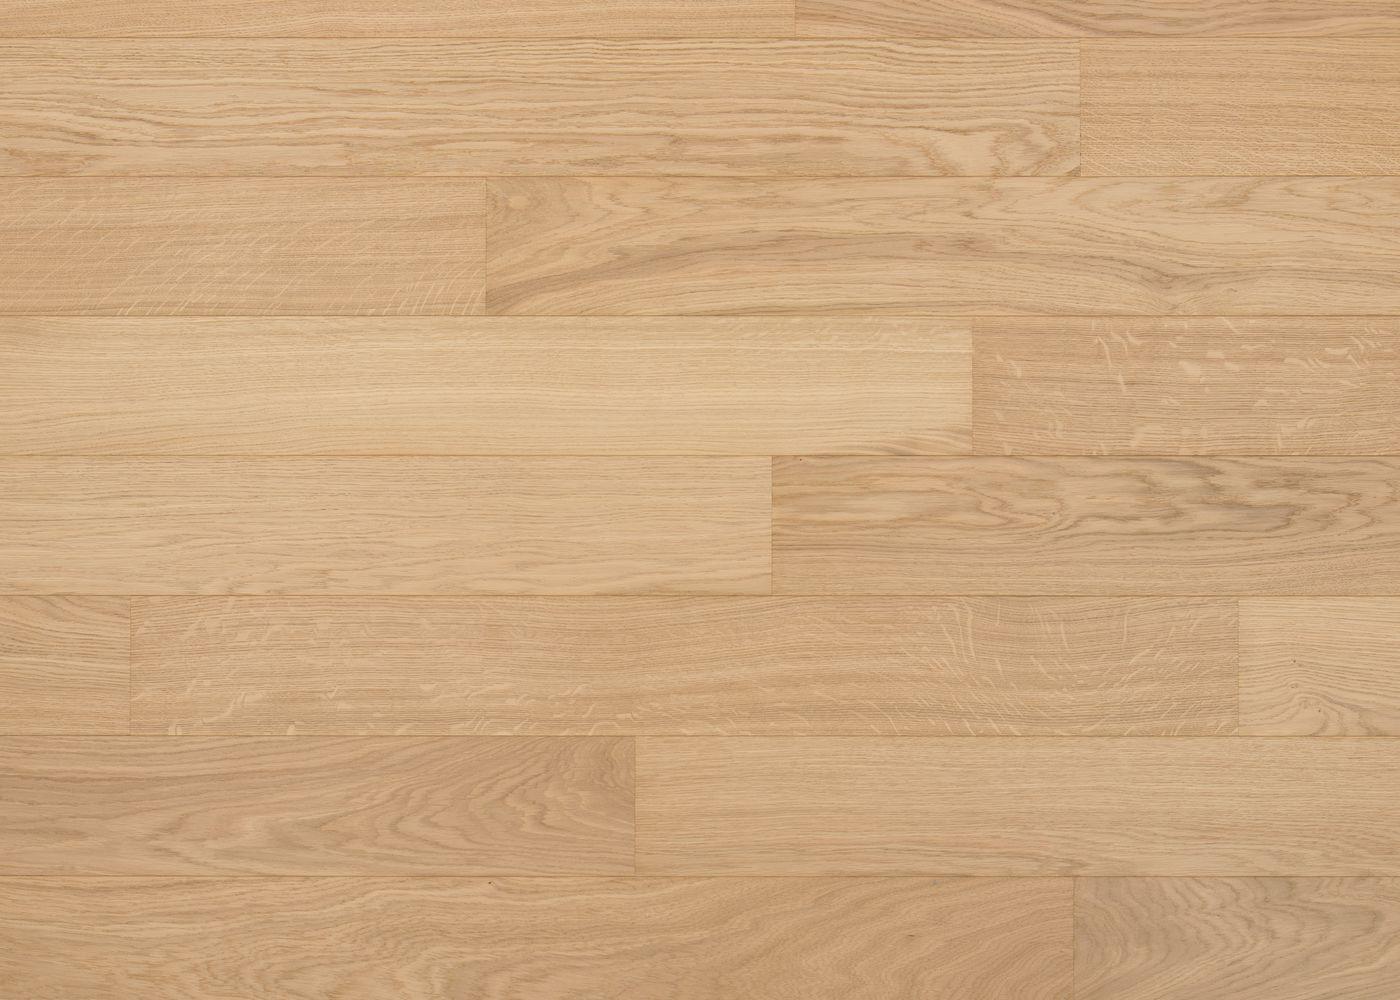 Sol plaqué bois Chêne Côme brossé vernis extra-mat - Deluxe - Select 12x166x1810